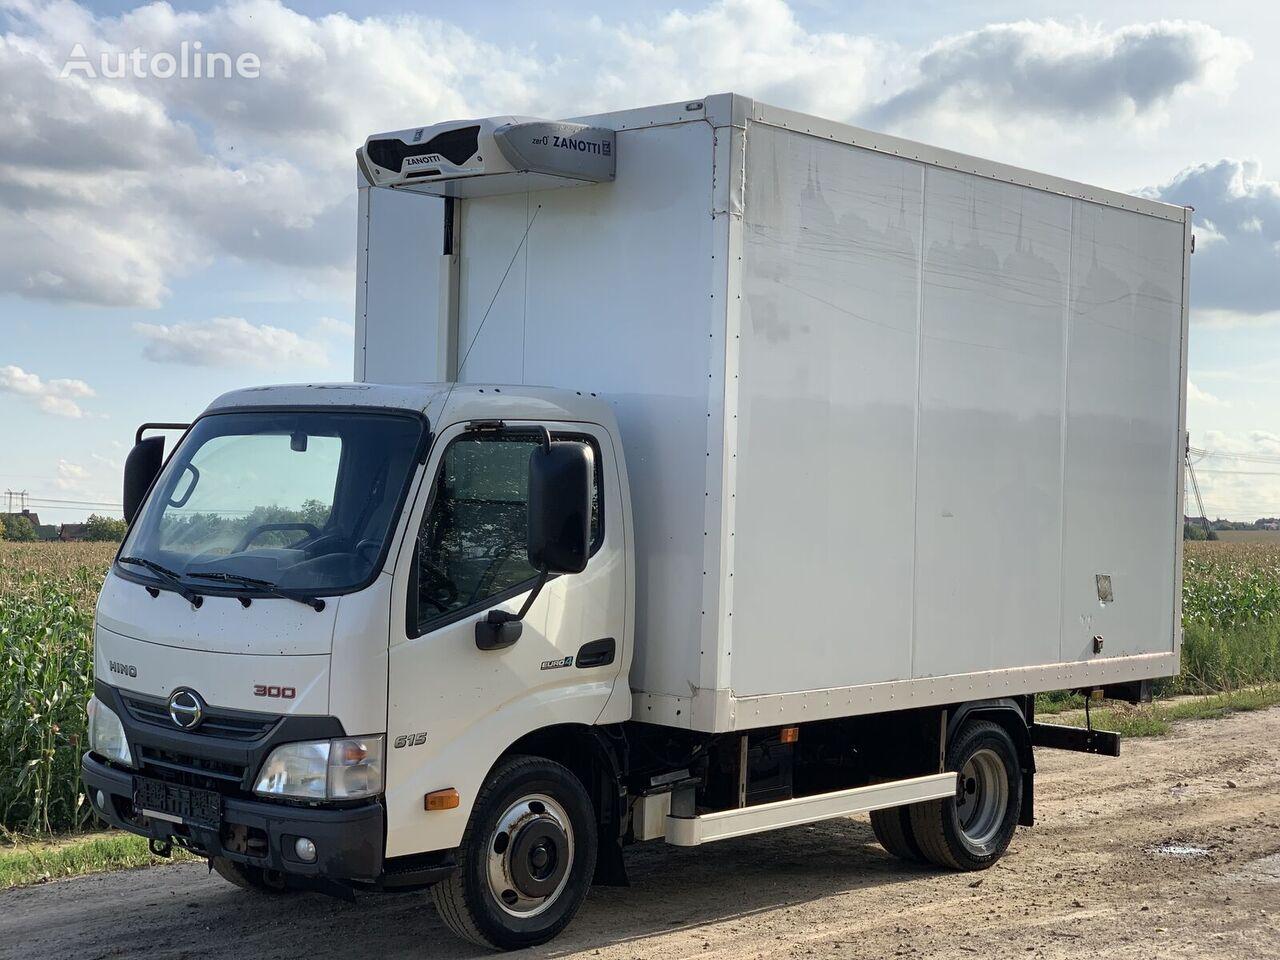 HINO 300 lastebil kjøl